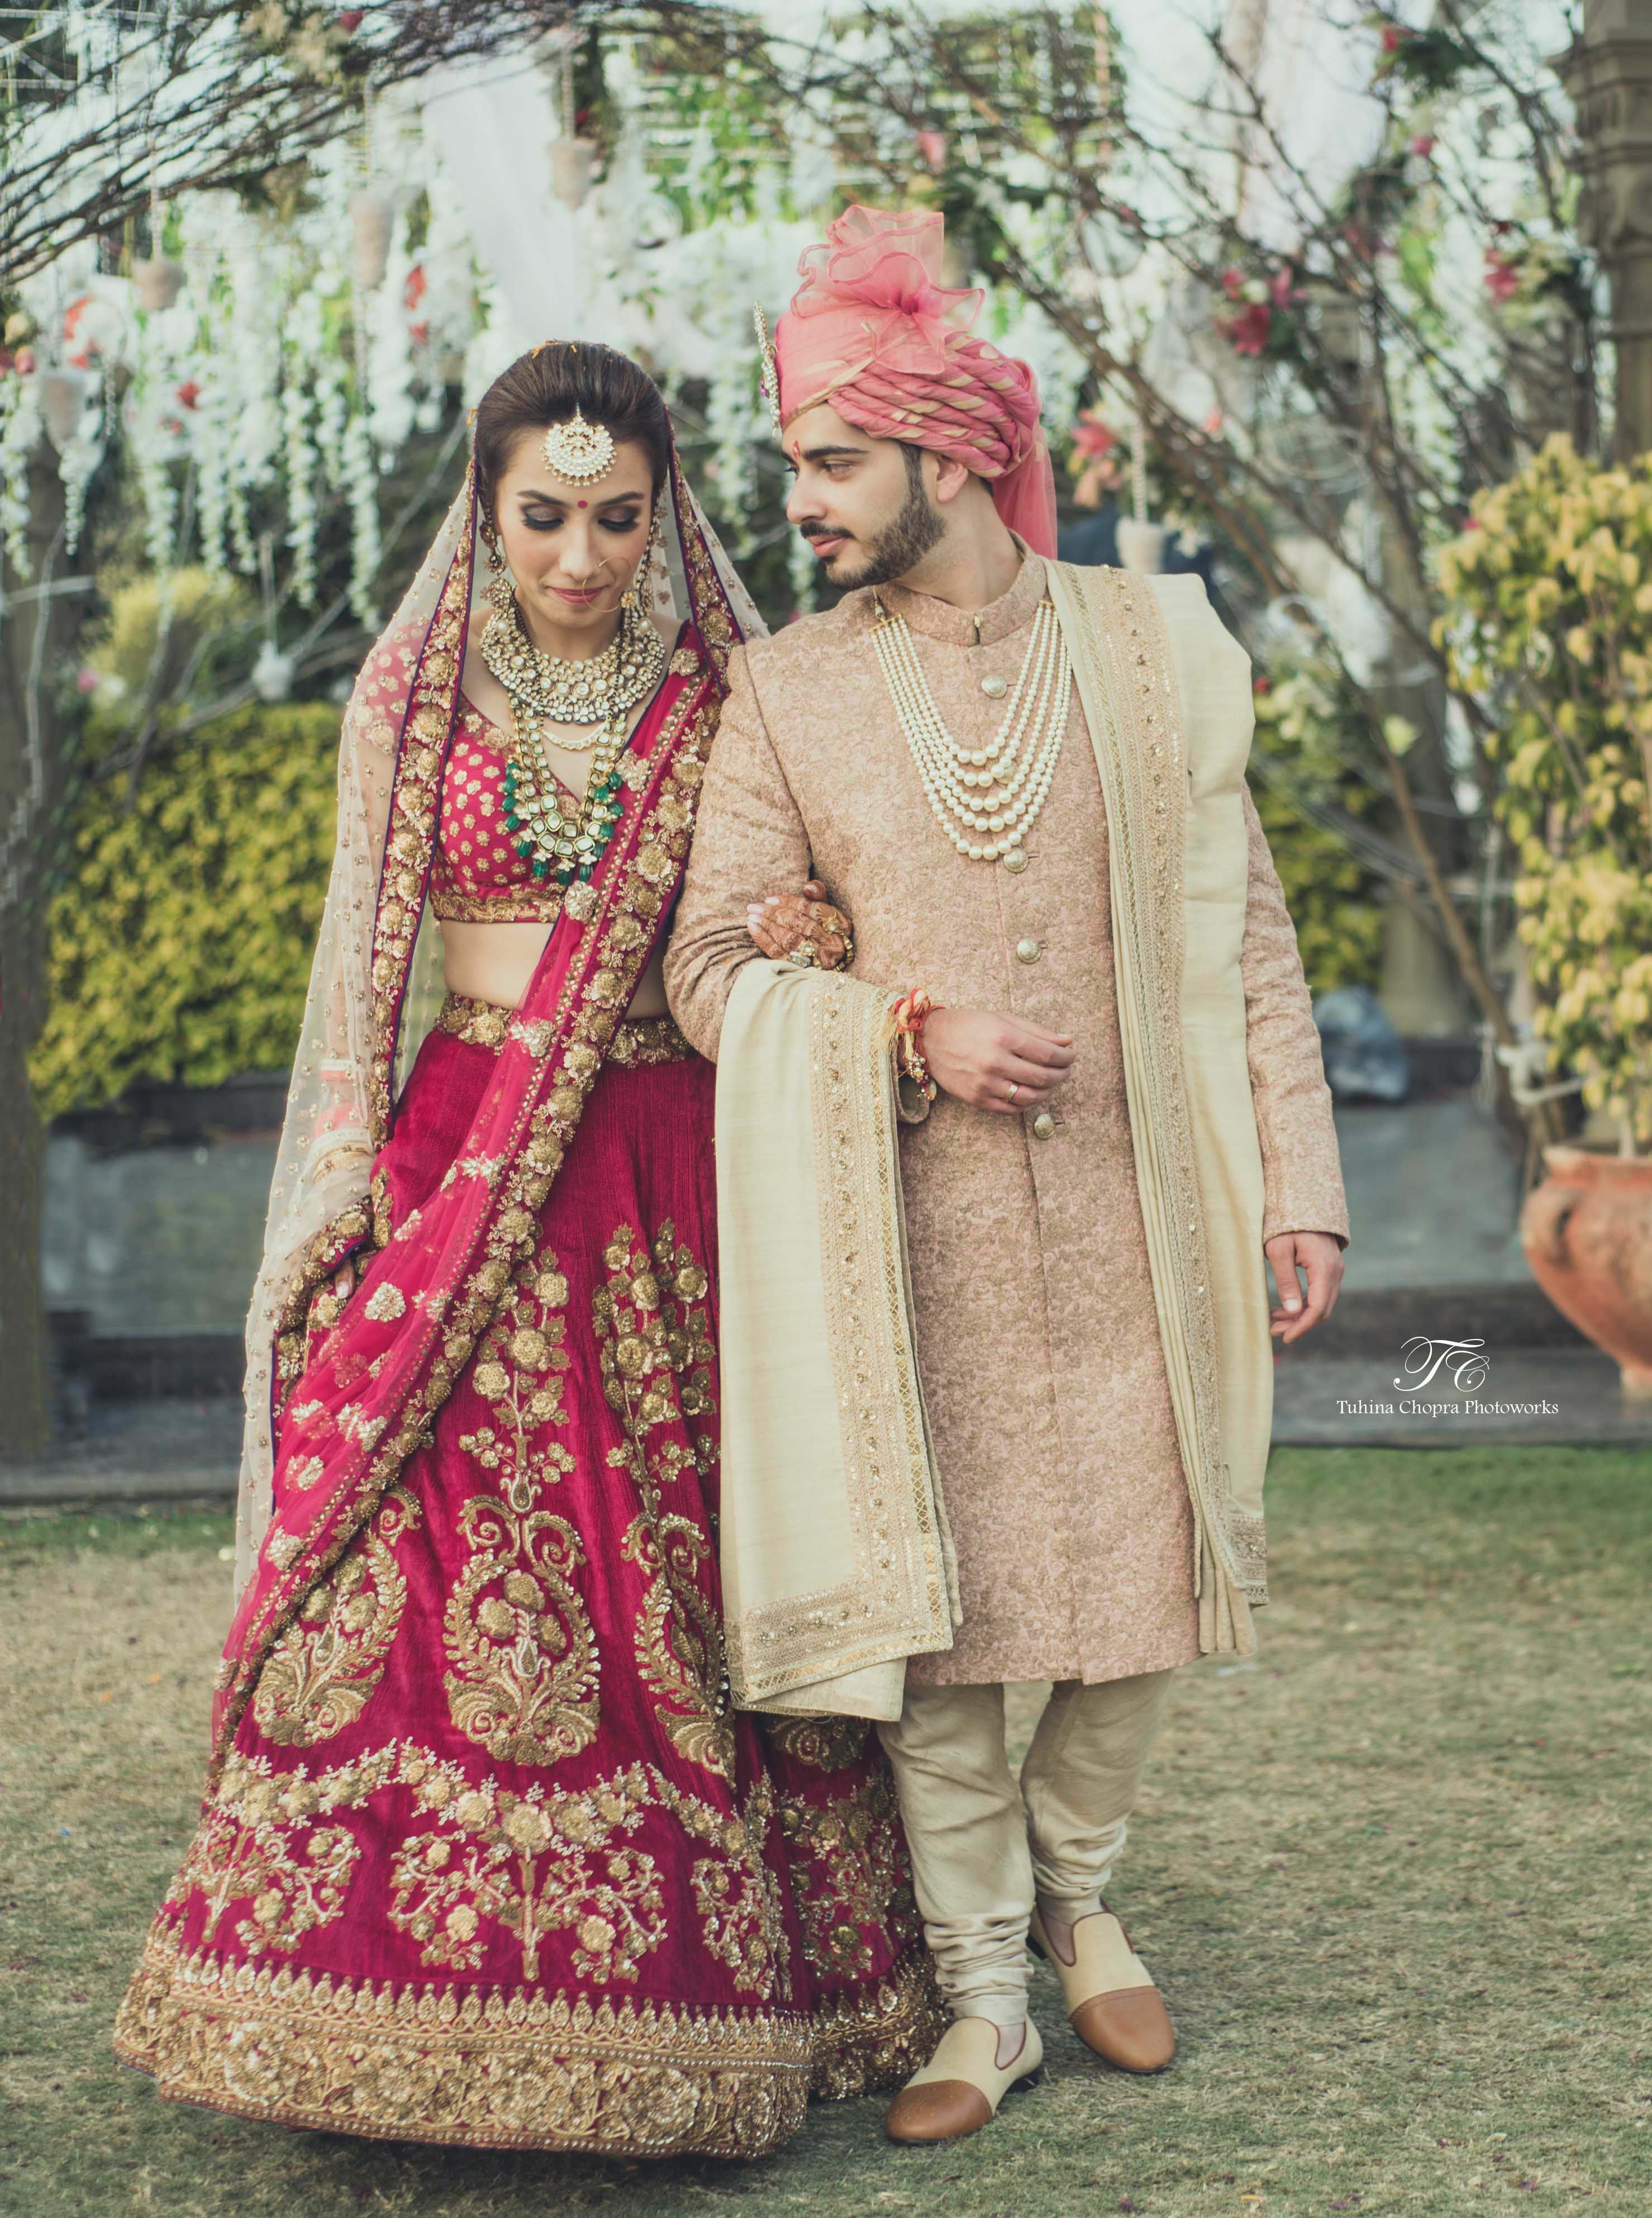 bride and groom:tuhina chopra photoworks